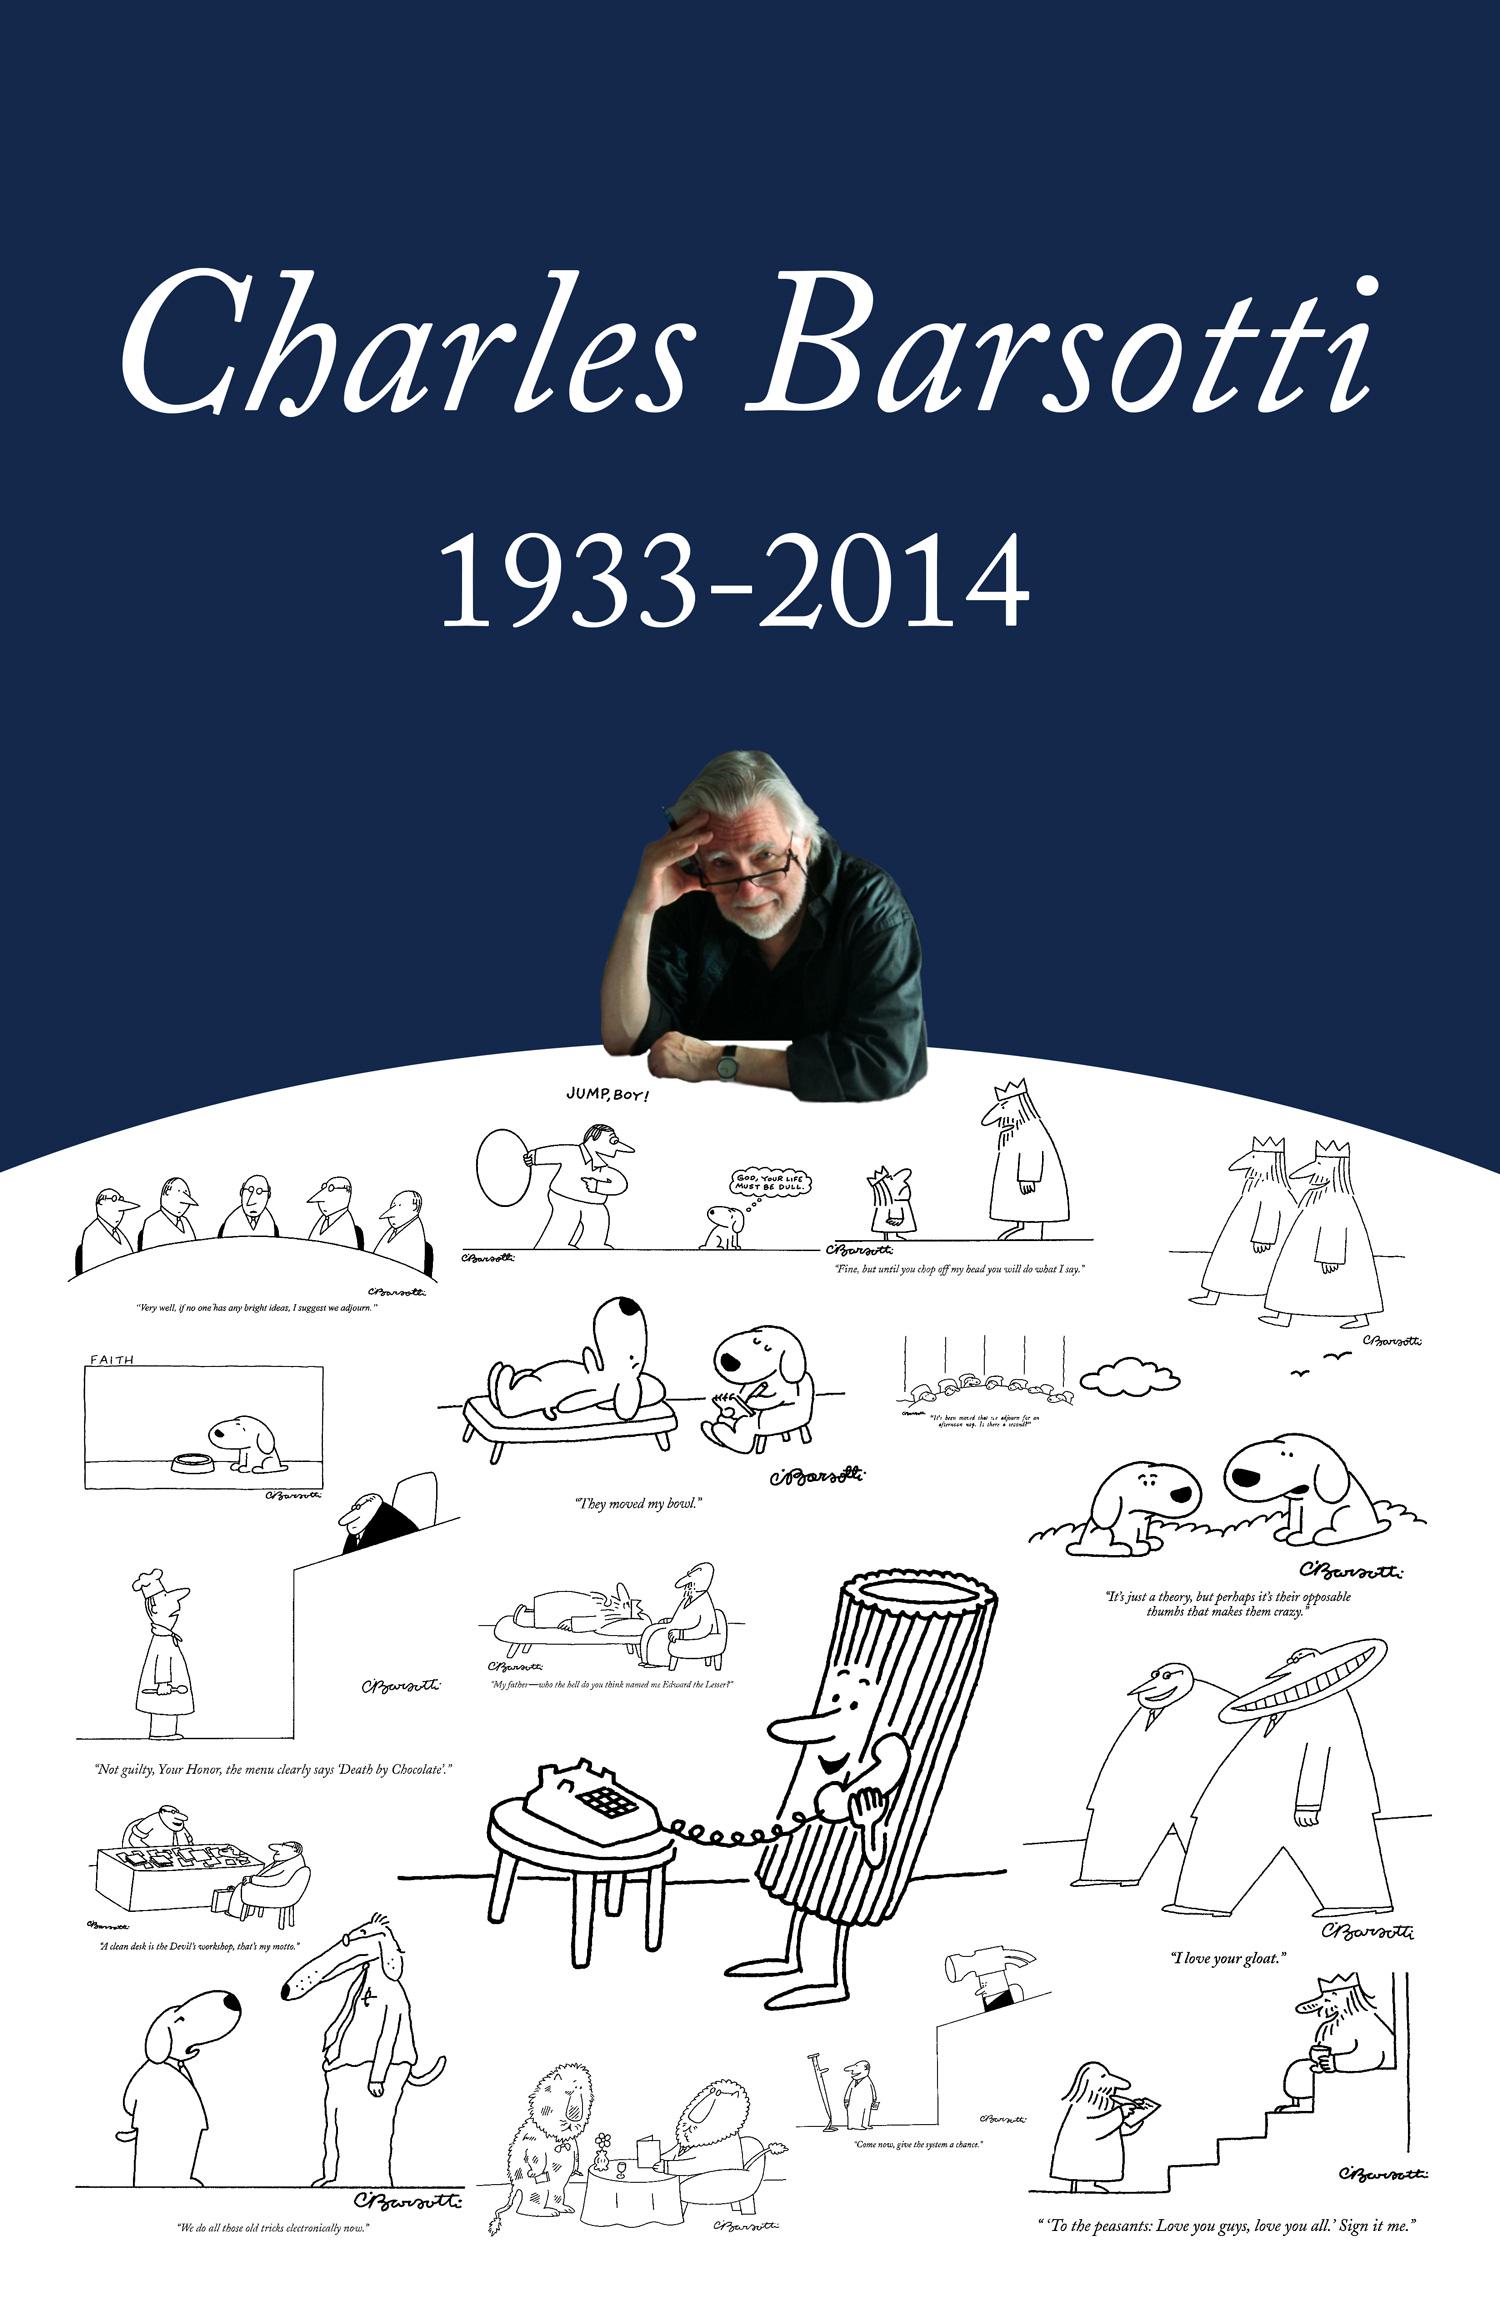 Poster honoring Charles Barsotti